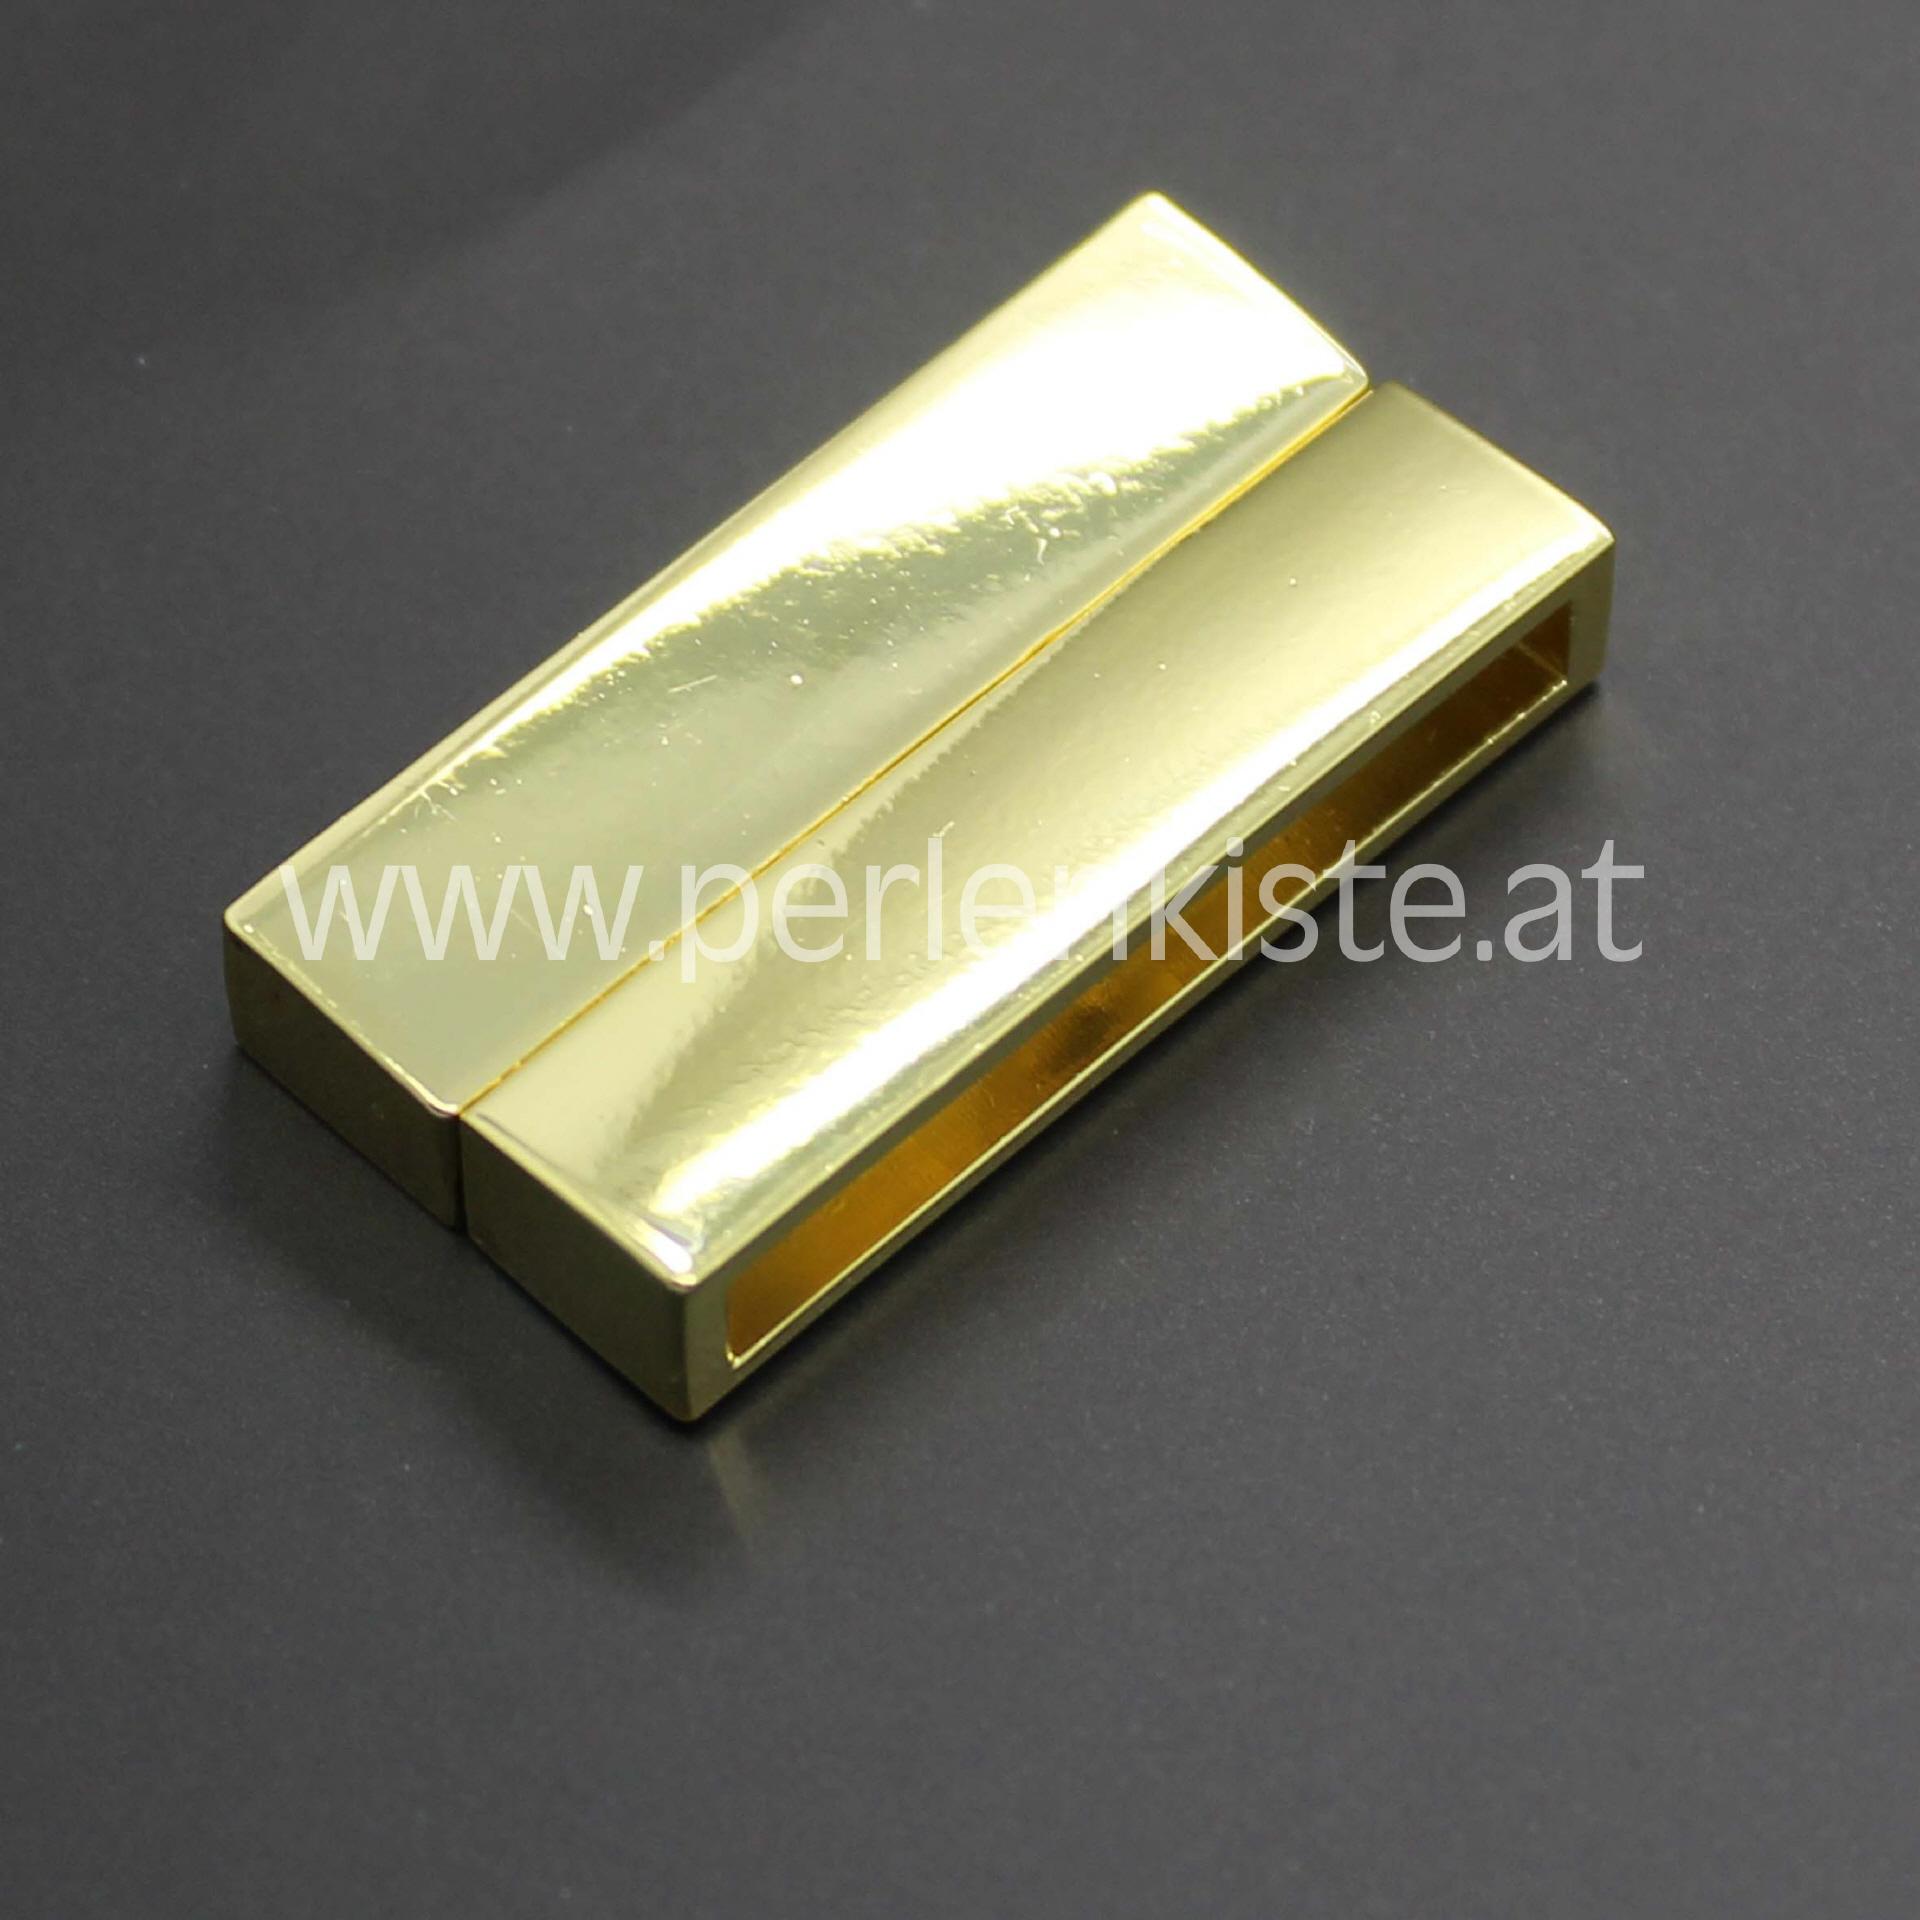 magnetverschluss 38 mm gold zum kleben. Black Bedroom Furniture Sets. Home Design Ideas